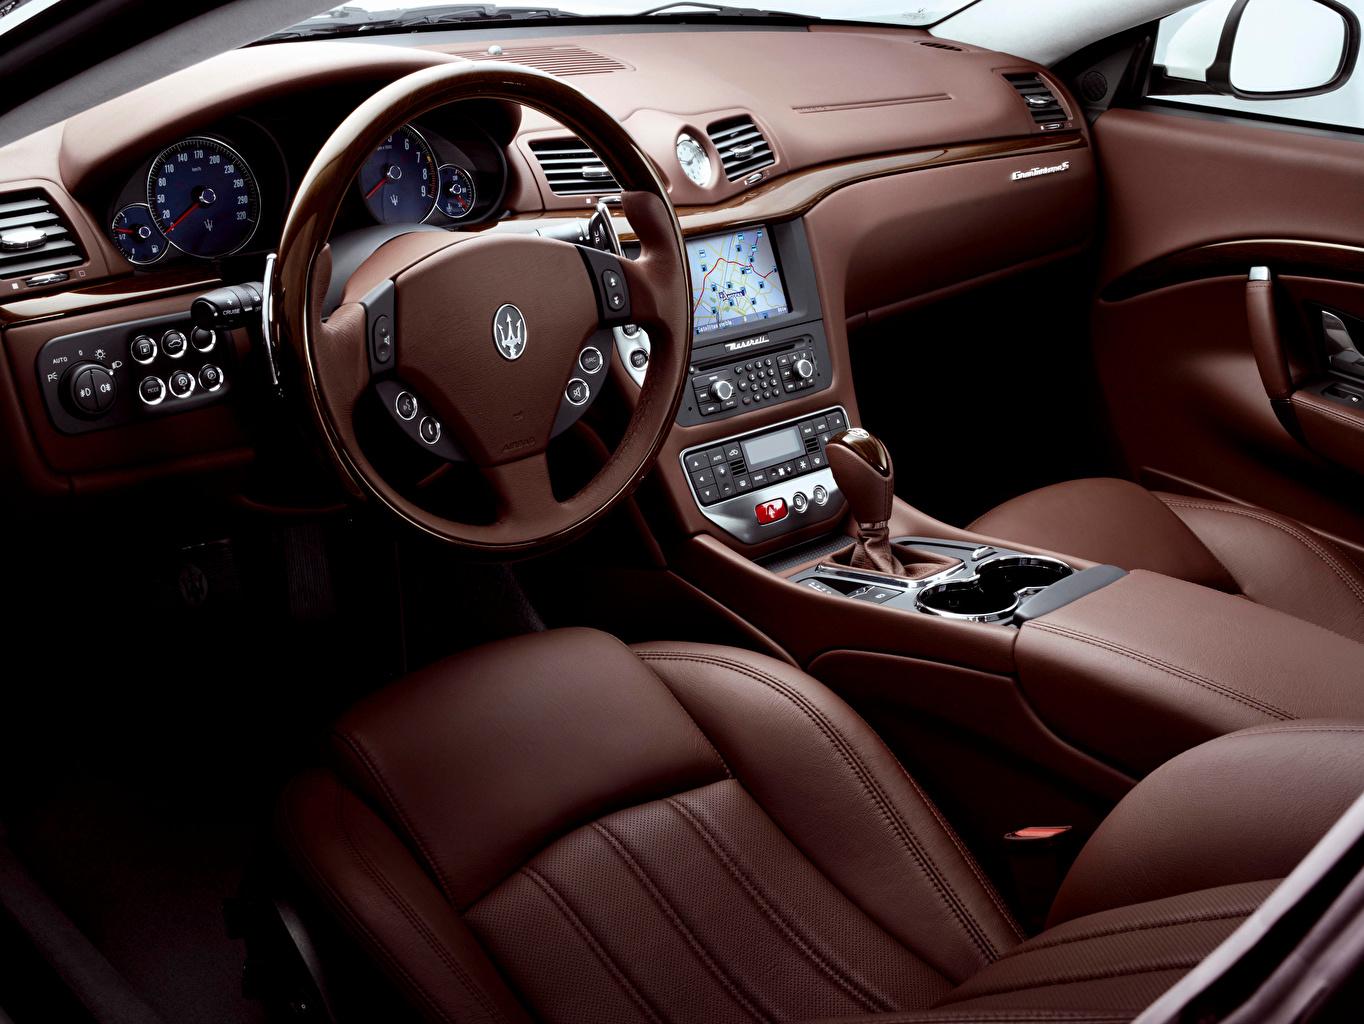 Desktop Hintergrundbilder Salons Maserati Lenkrad Leder Autos auto automobil